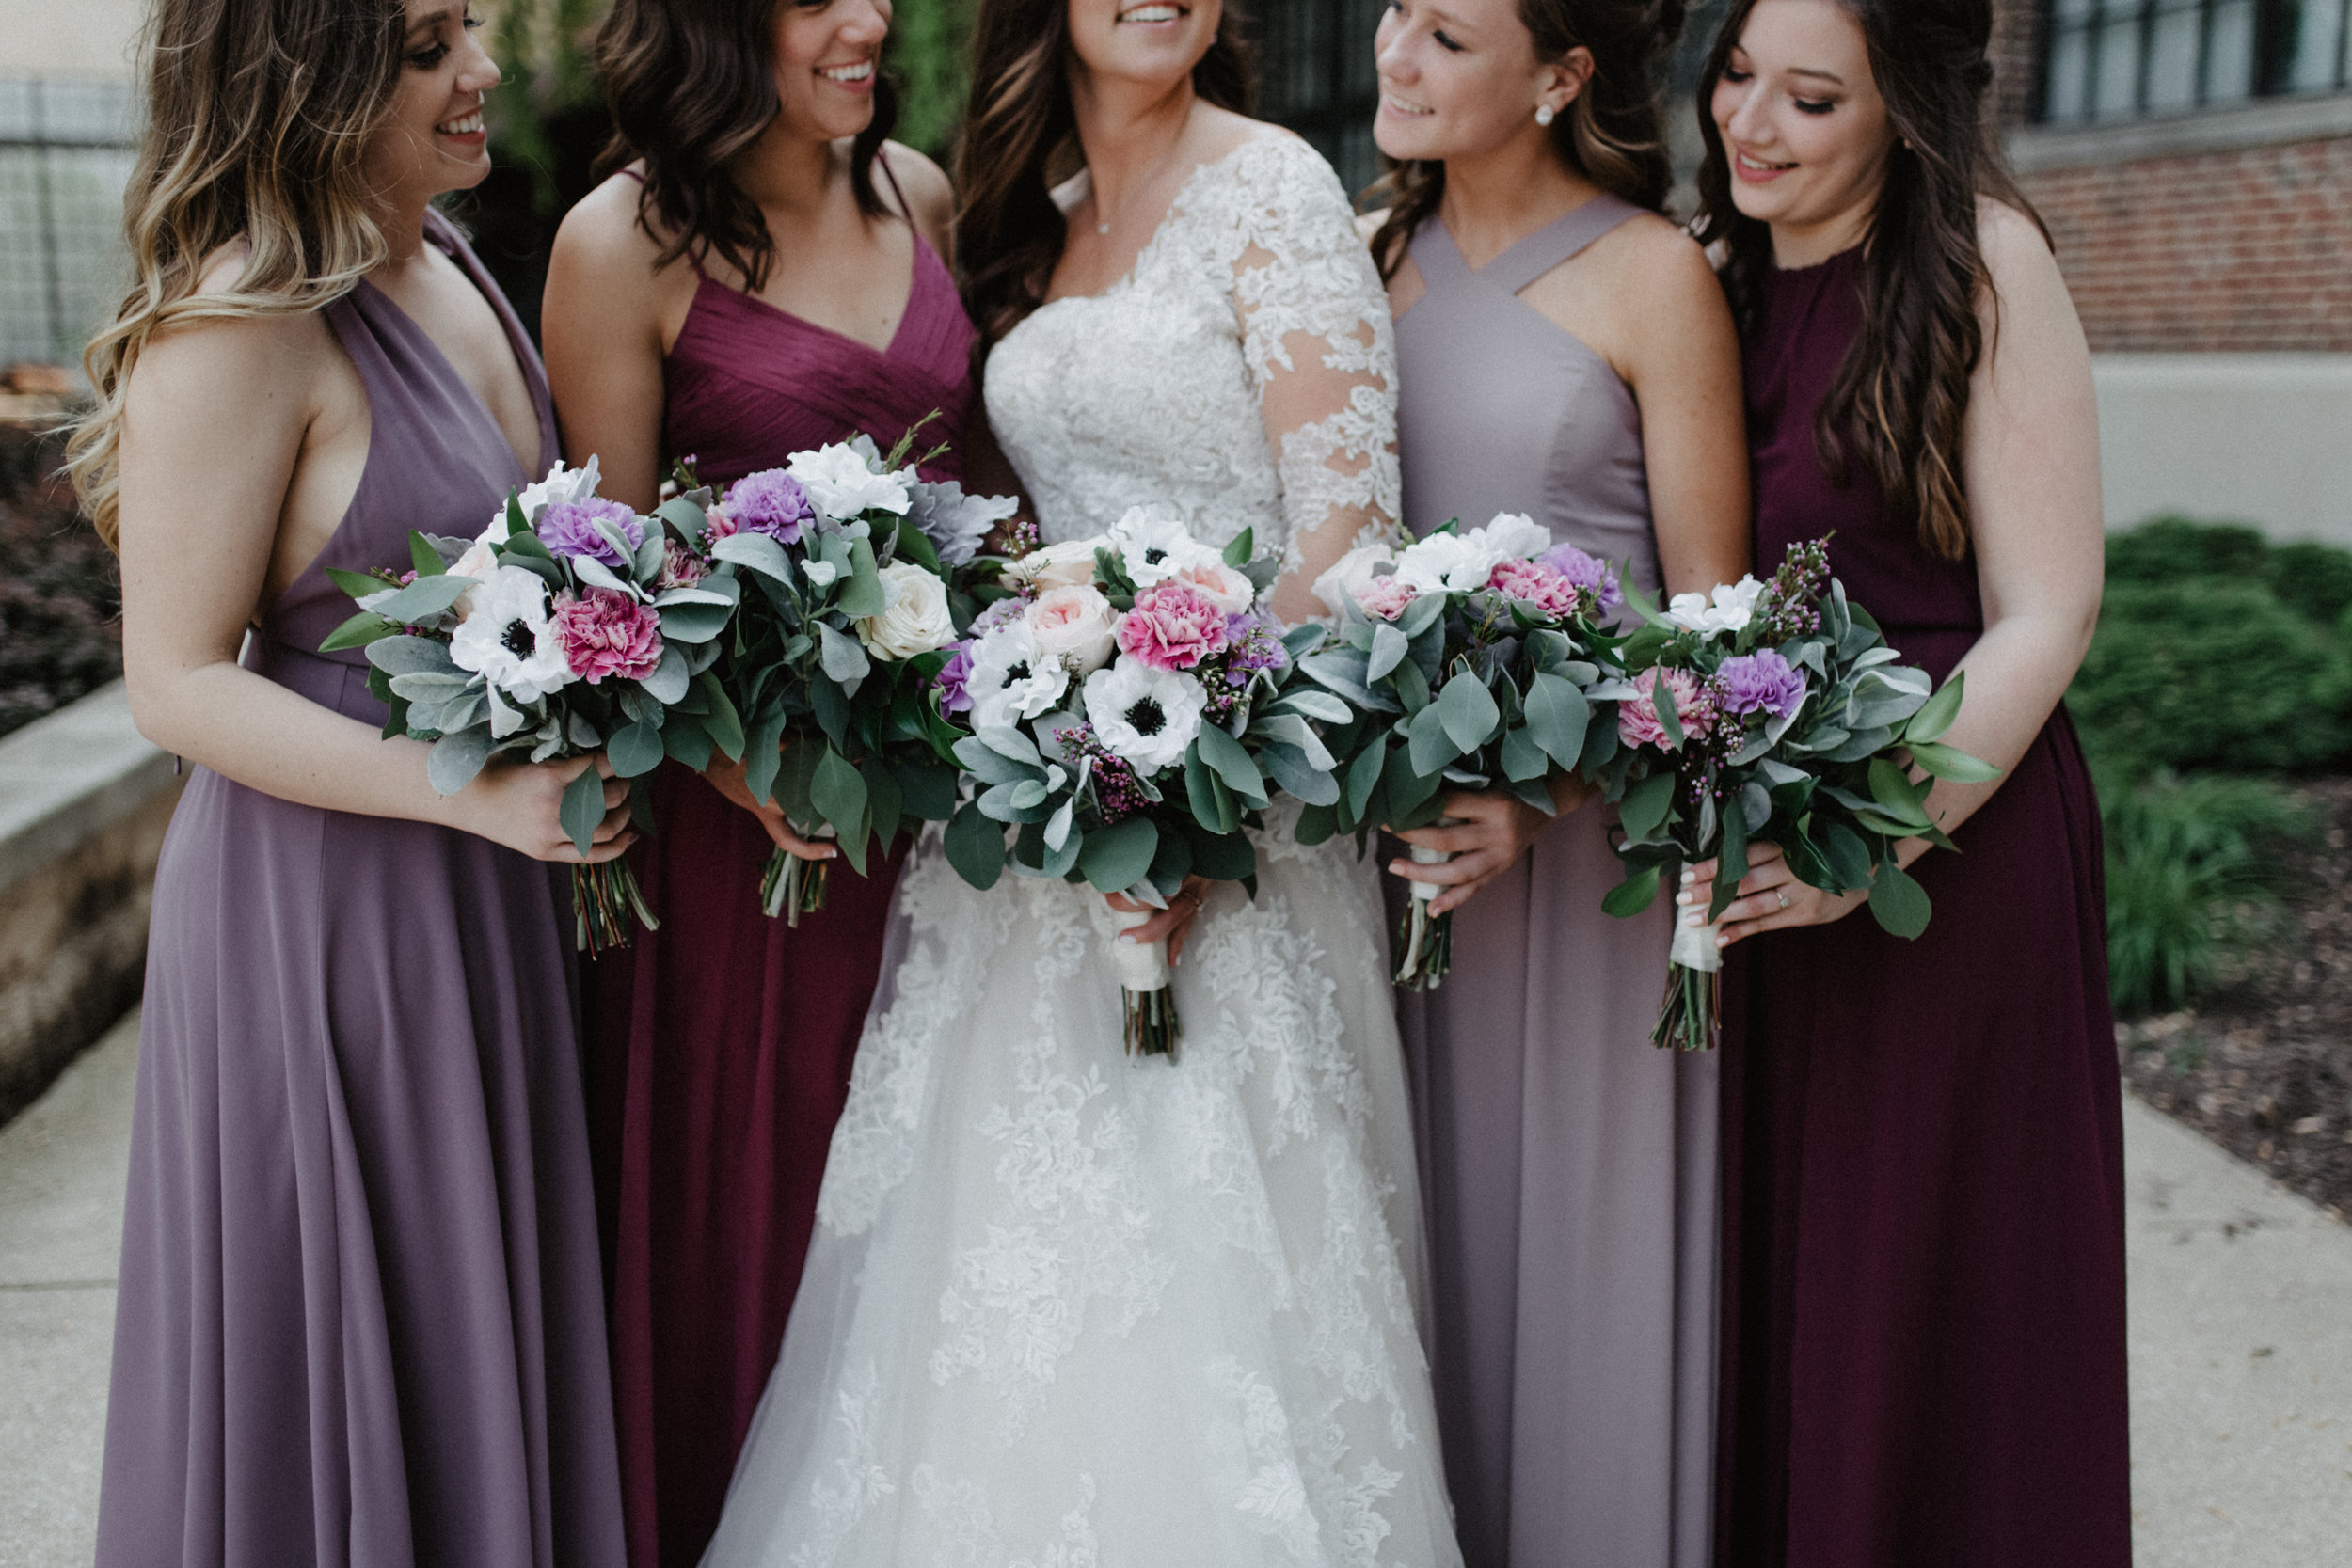 GRAYCENTOMHAMILTON-GRAND-RAPIDS-WEDDING-PHOTOGRAPHY-41.jpg